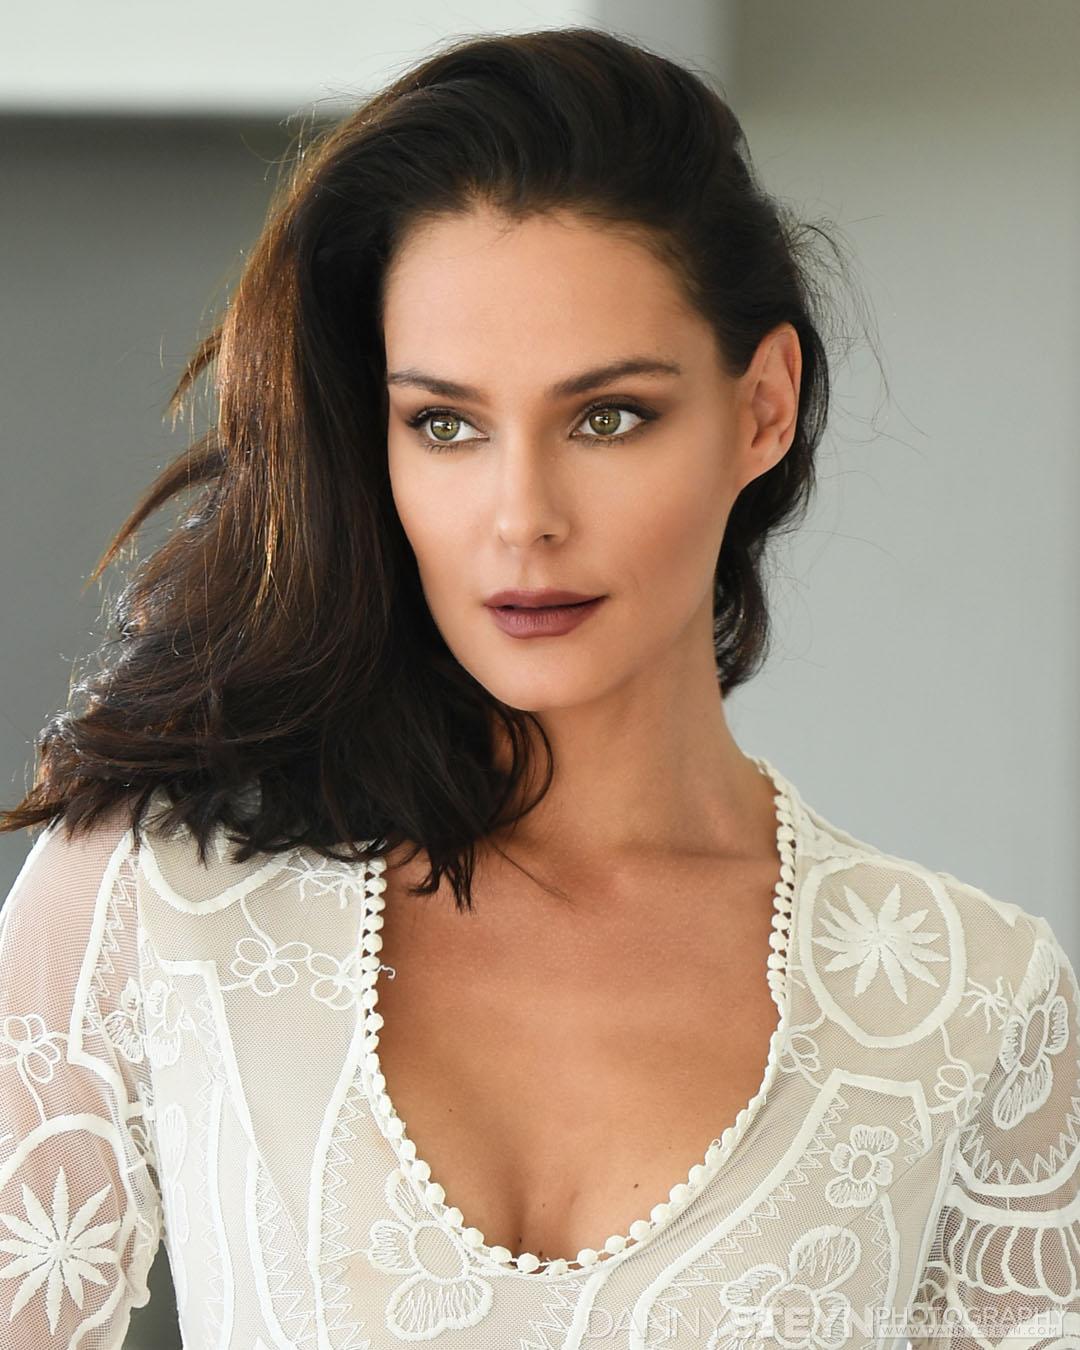 Glamour Model Photographer Fort Lauderdale